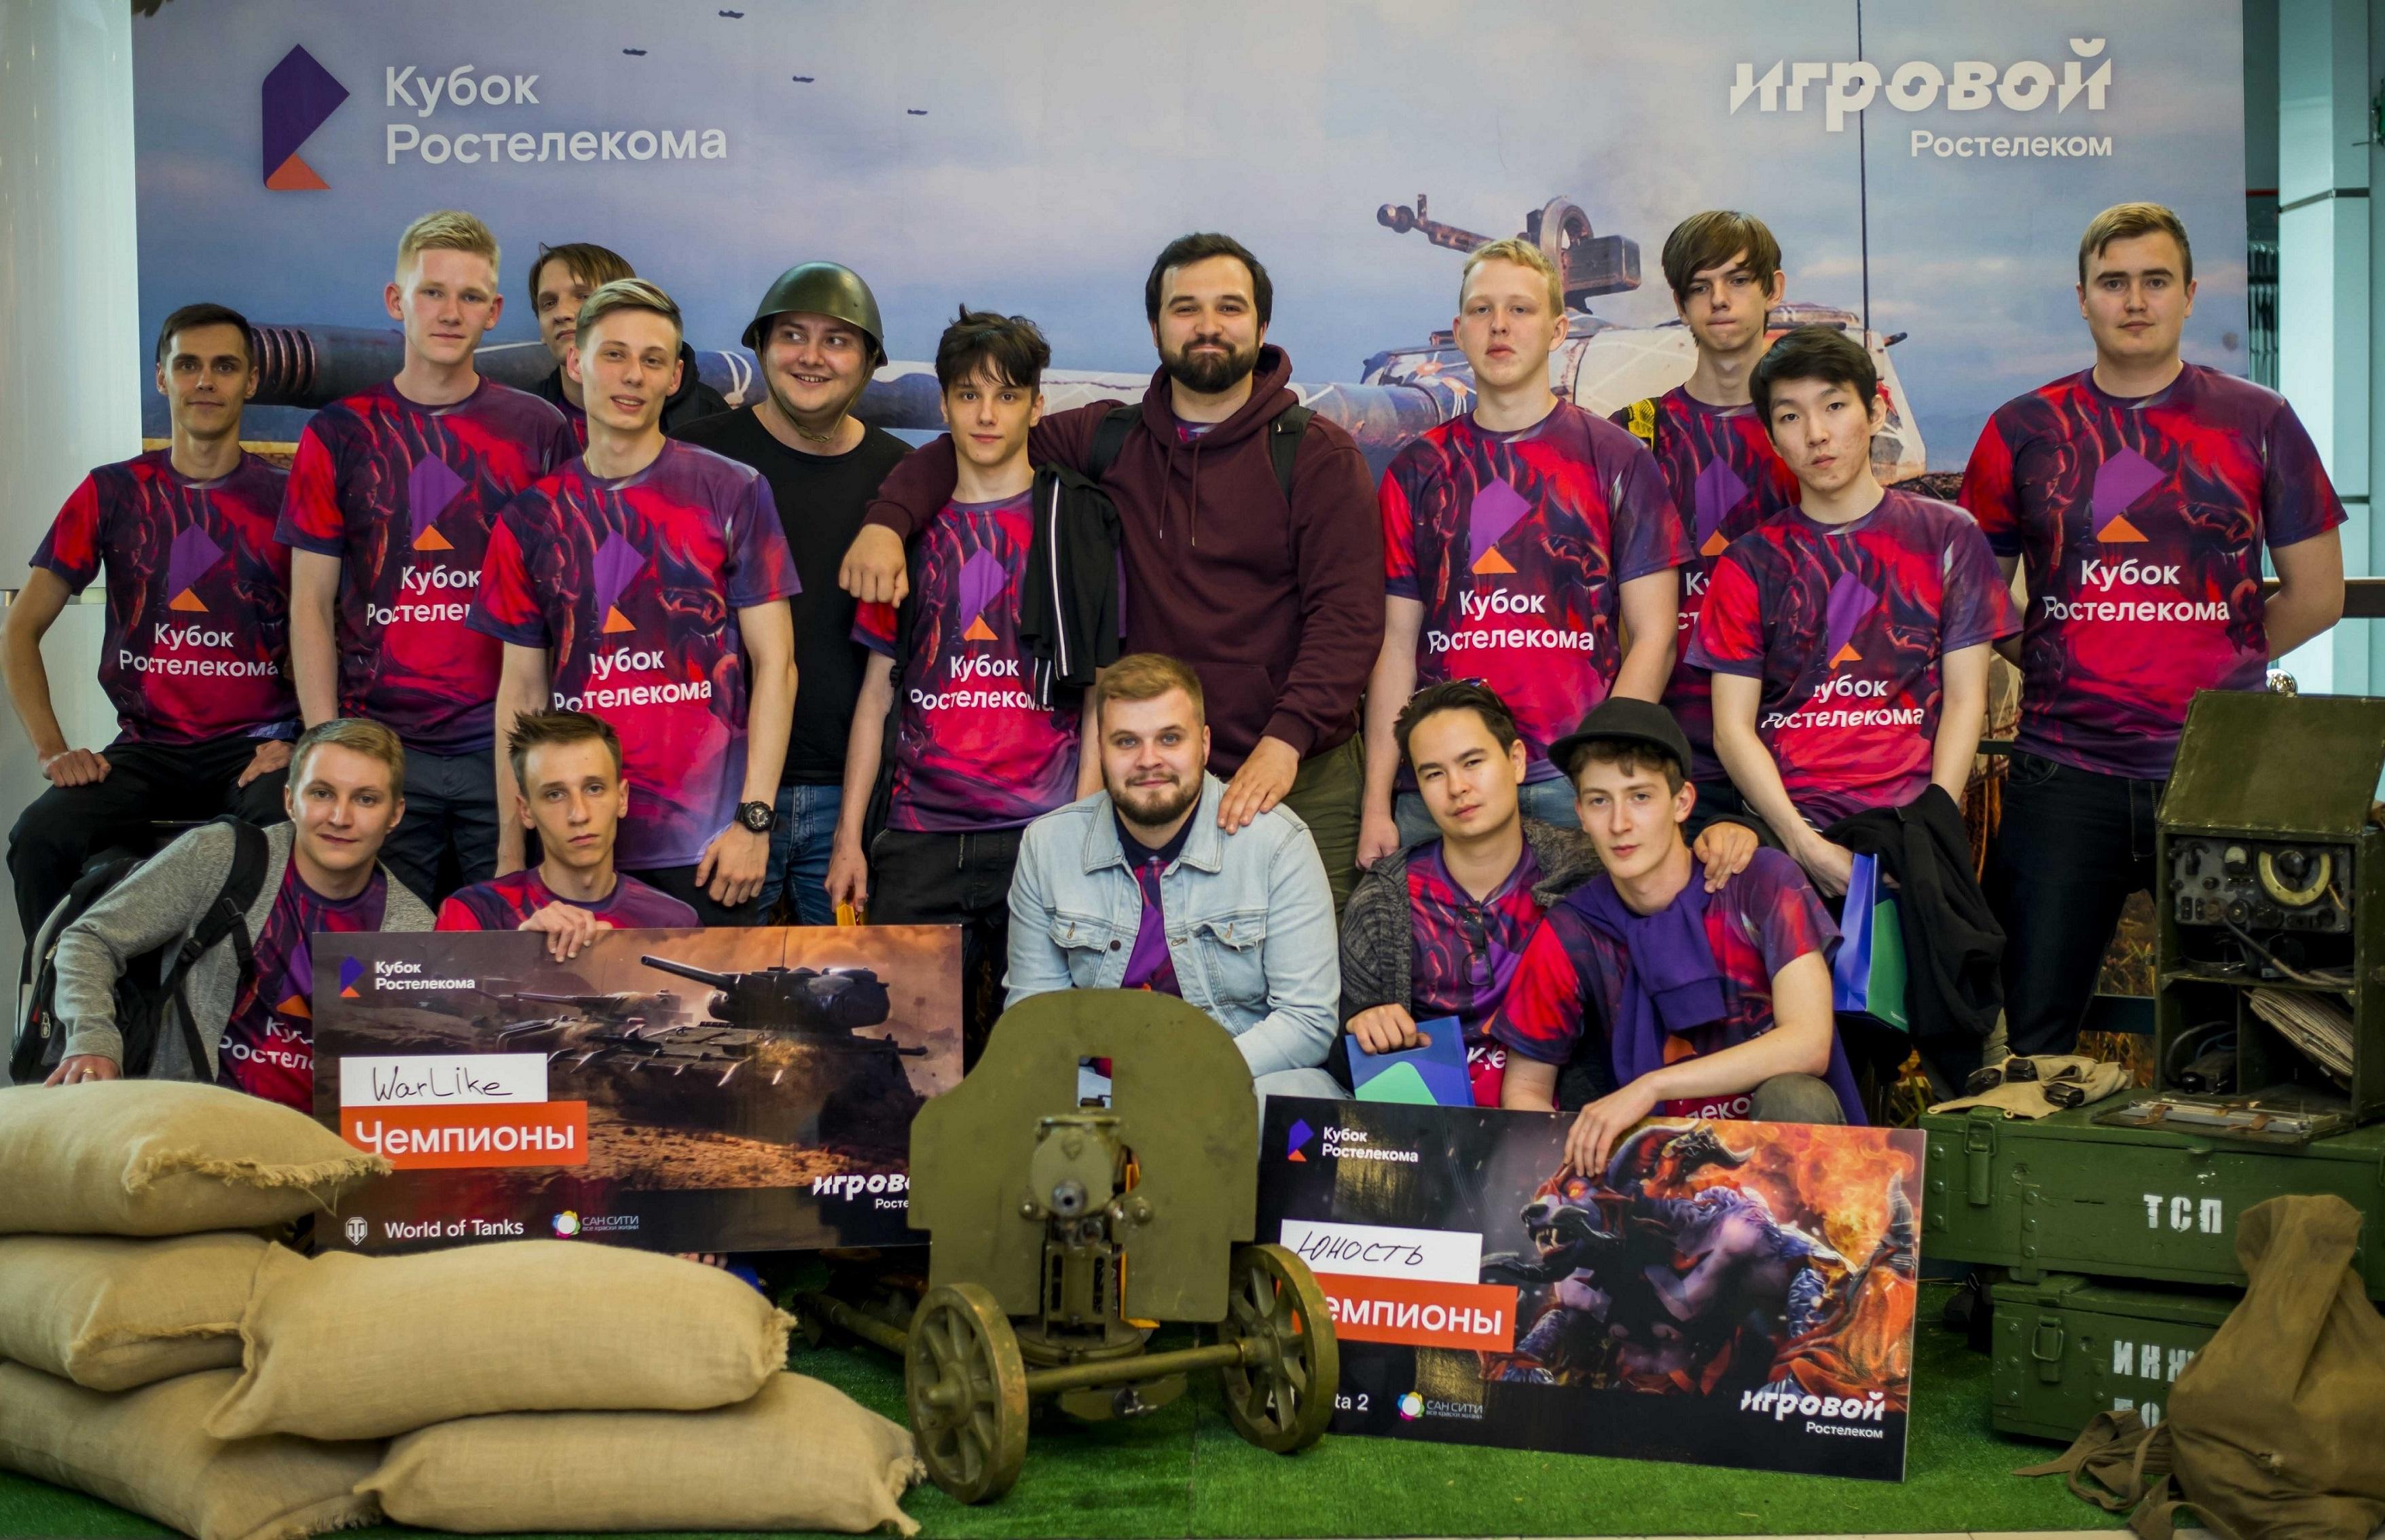 Сибирские киберспортсмены сразятся за «Кубок Ростелекома» в онлайн-турниреСибирские киберспортсмены сразятся за «Кубок Ростелекома» в онлайн-турнире